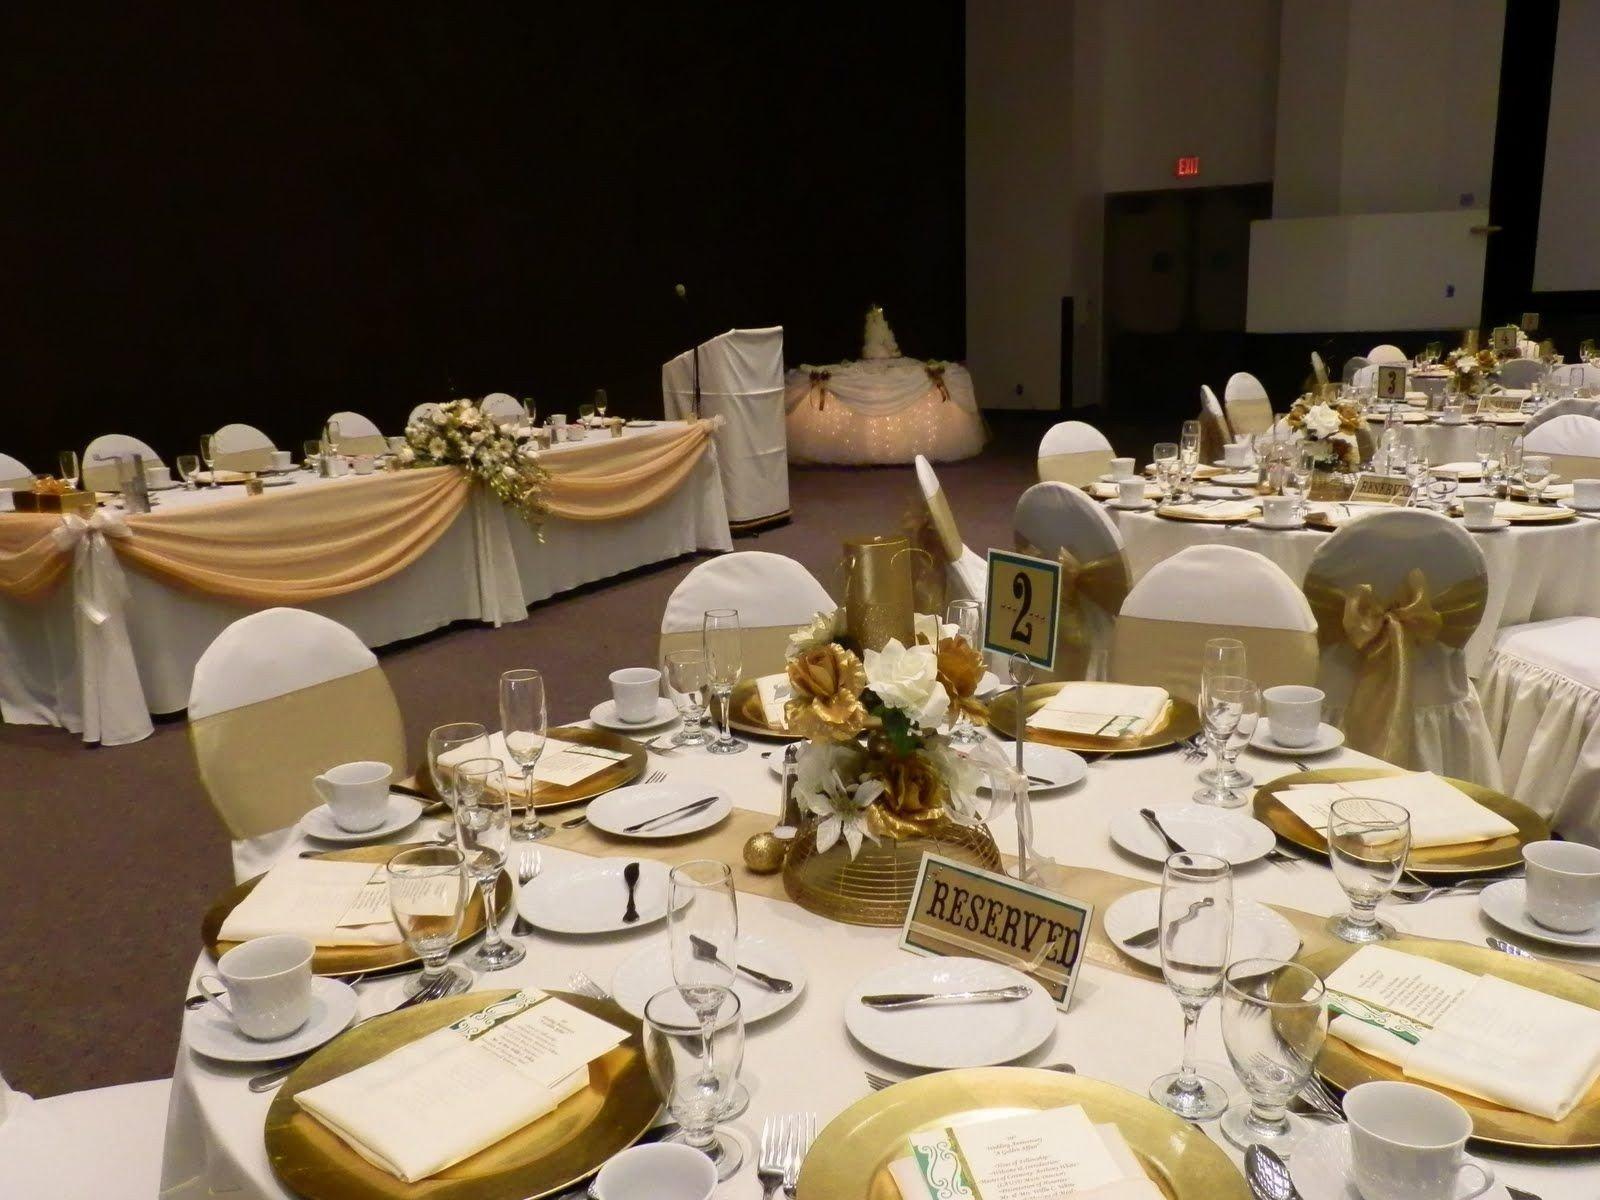 10 Perfect Ideas For 50Th Wedding Anniversary Party lovely centerpieces for 50th wedding anniversary party daniel pianetti 2020